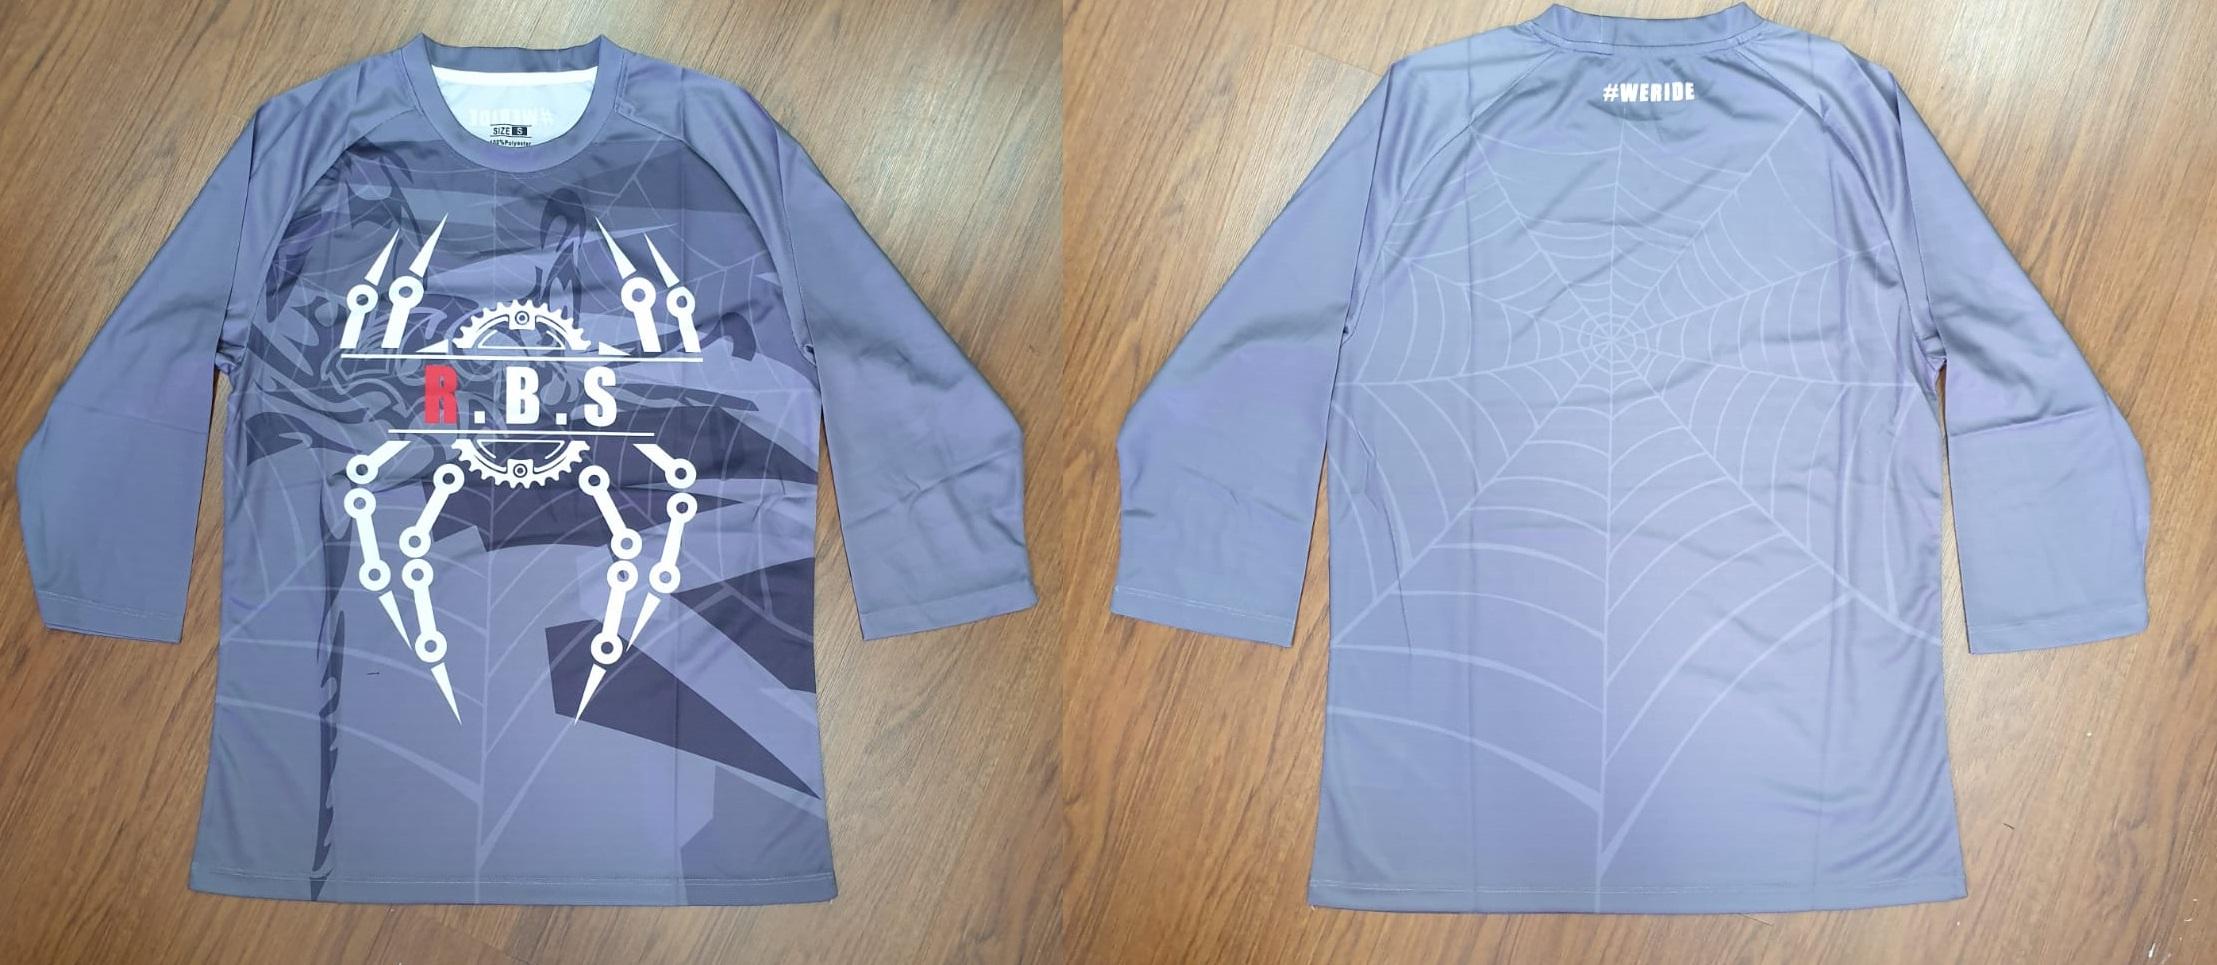 mountain bike jersey